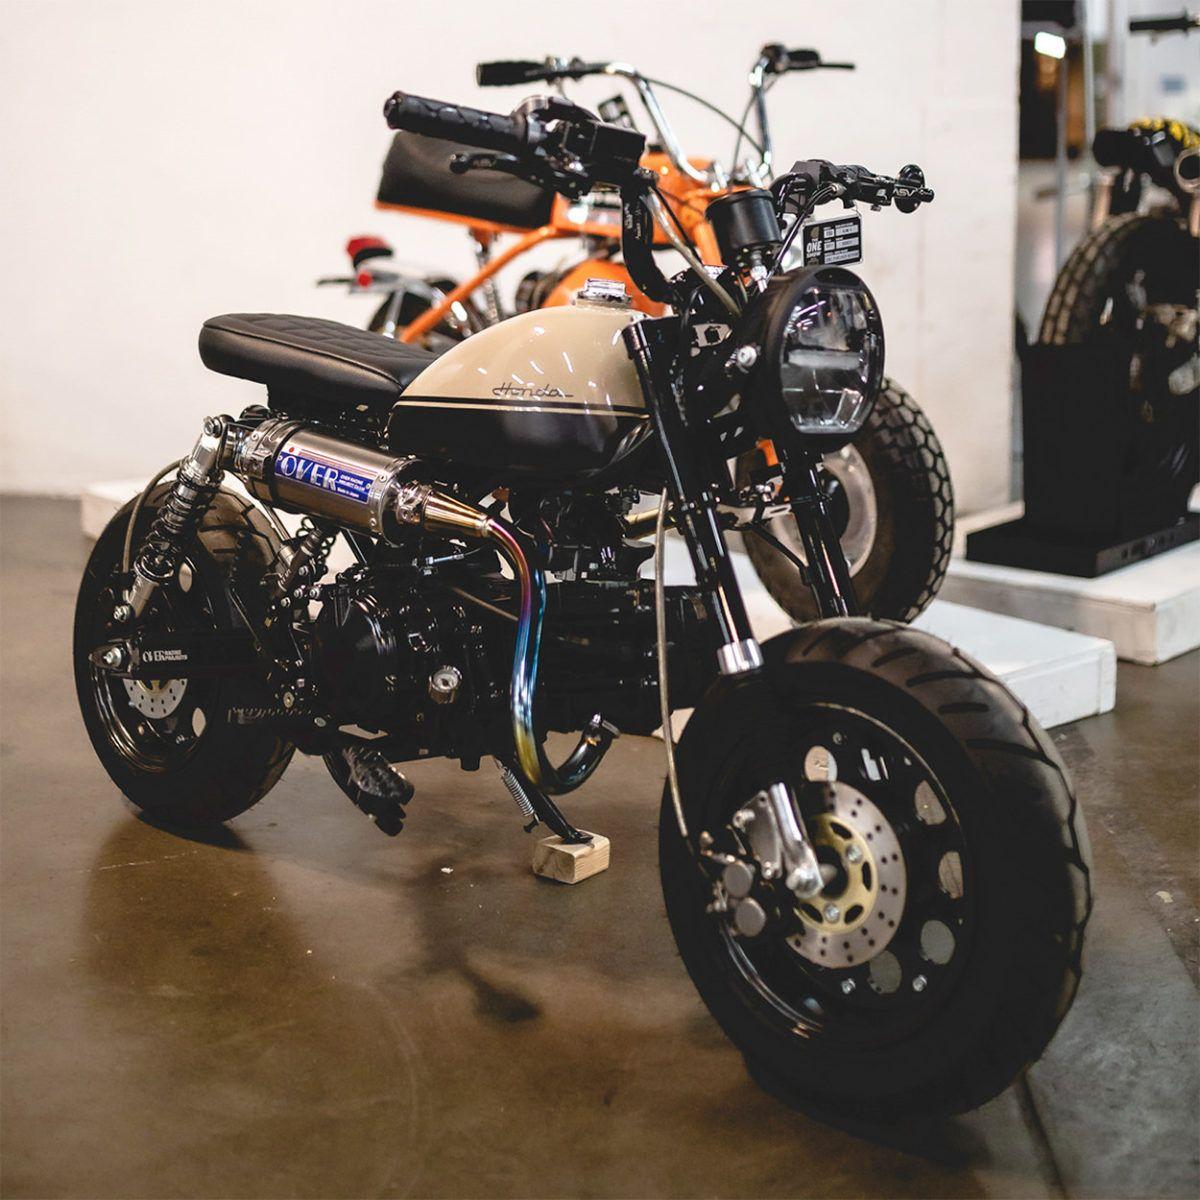 Custom Bikes Of The Week 15 March 2020 Bike Exif In 2020 Custom Bikes Custom Bikes Cafe Racers Honda Grom